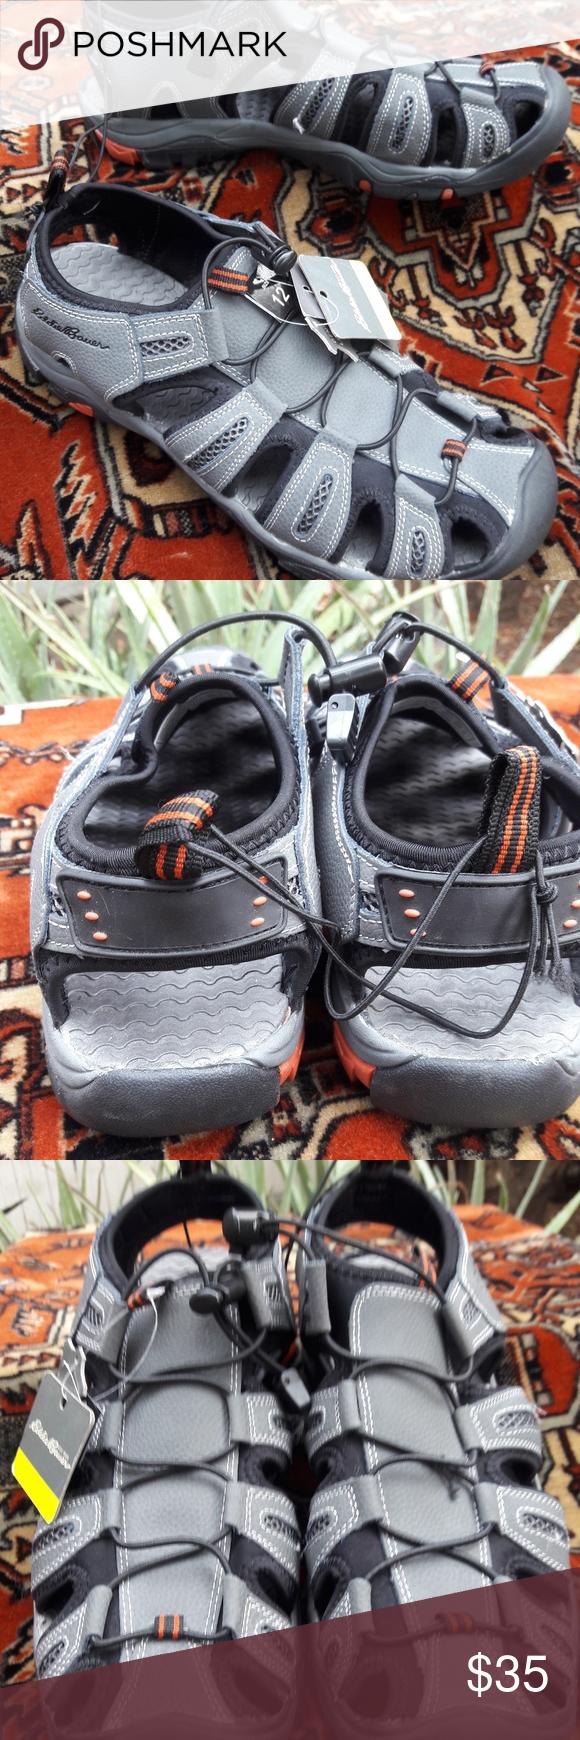 2c7f67af0216 Eddie Bauer Sandals Beautiful pair of men s